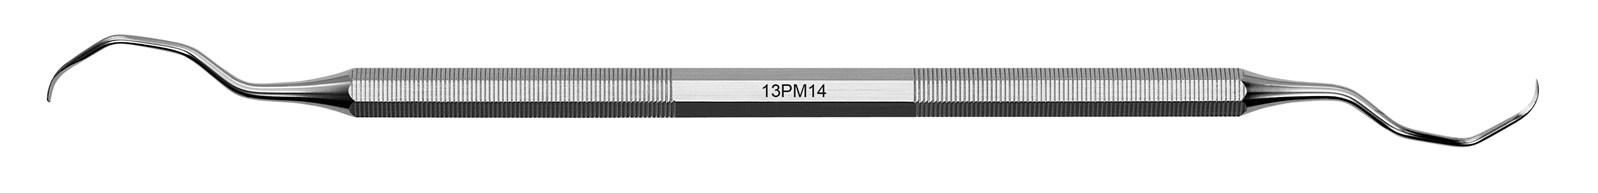 Kyreta Gracey Mini - 13PM14, ADEP fialový